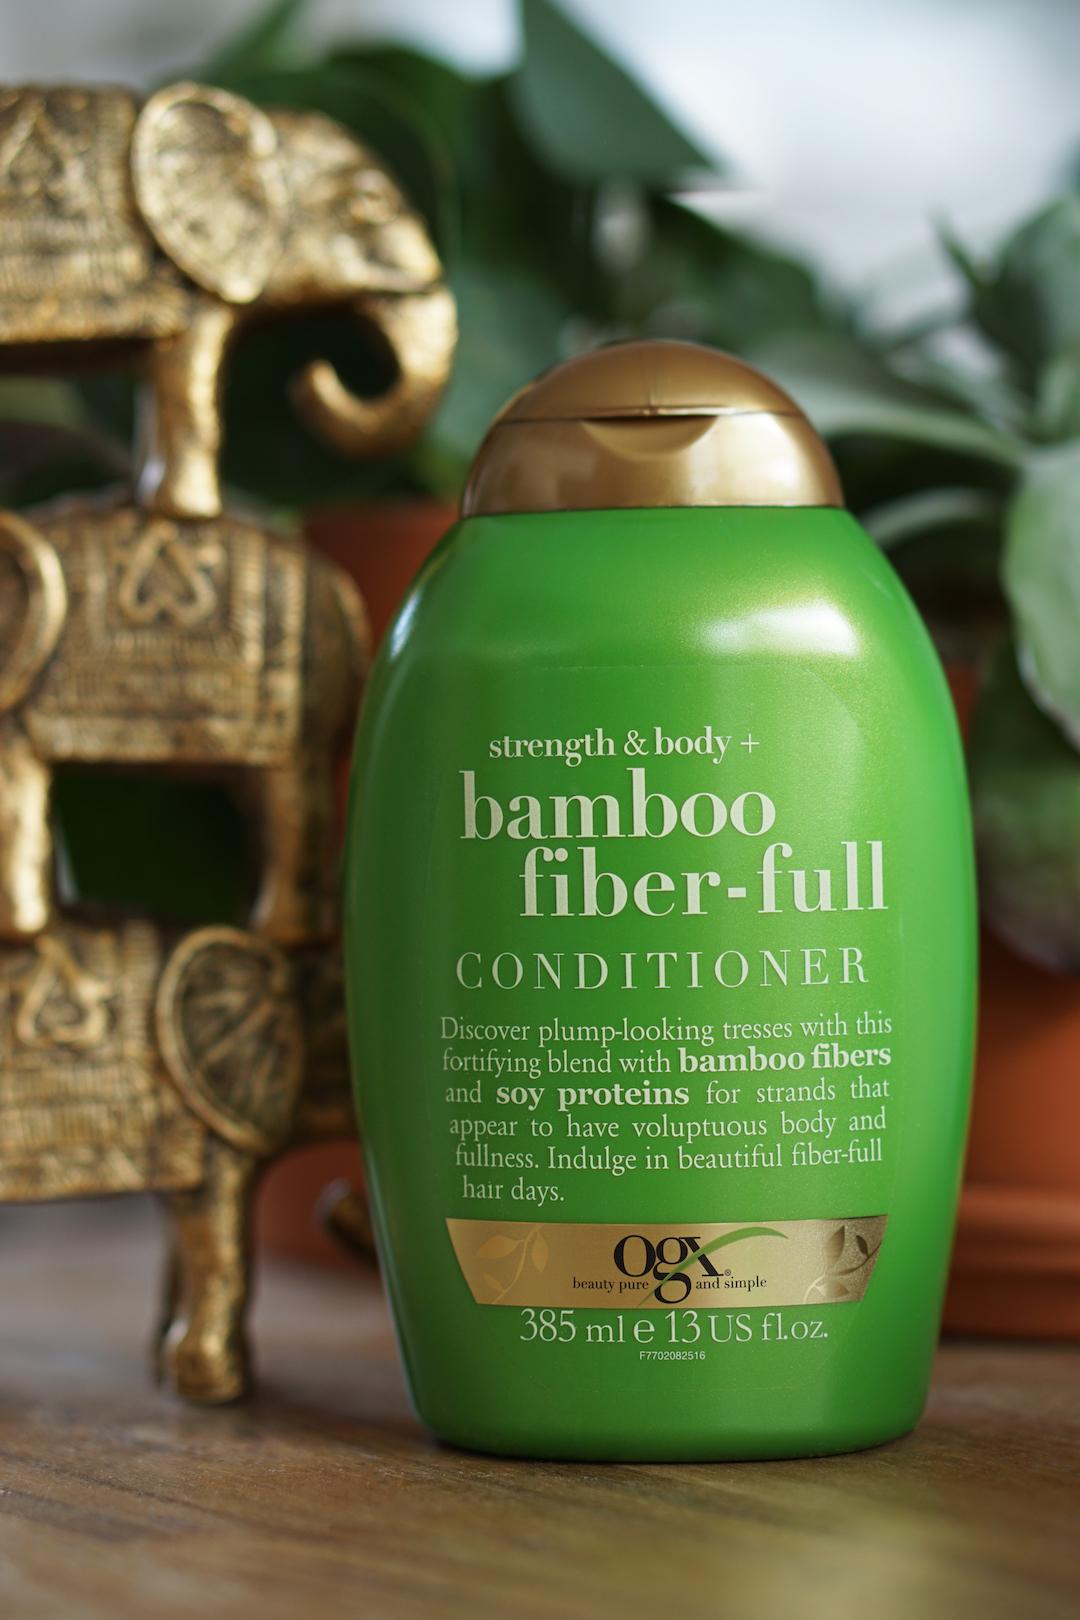 OGX Strength & Body Bamboo Fiber-full shampoo, conditioner